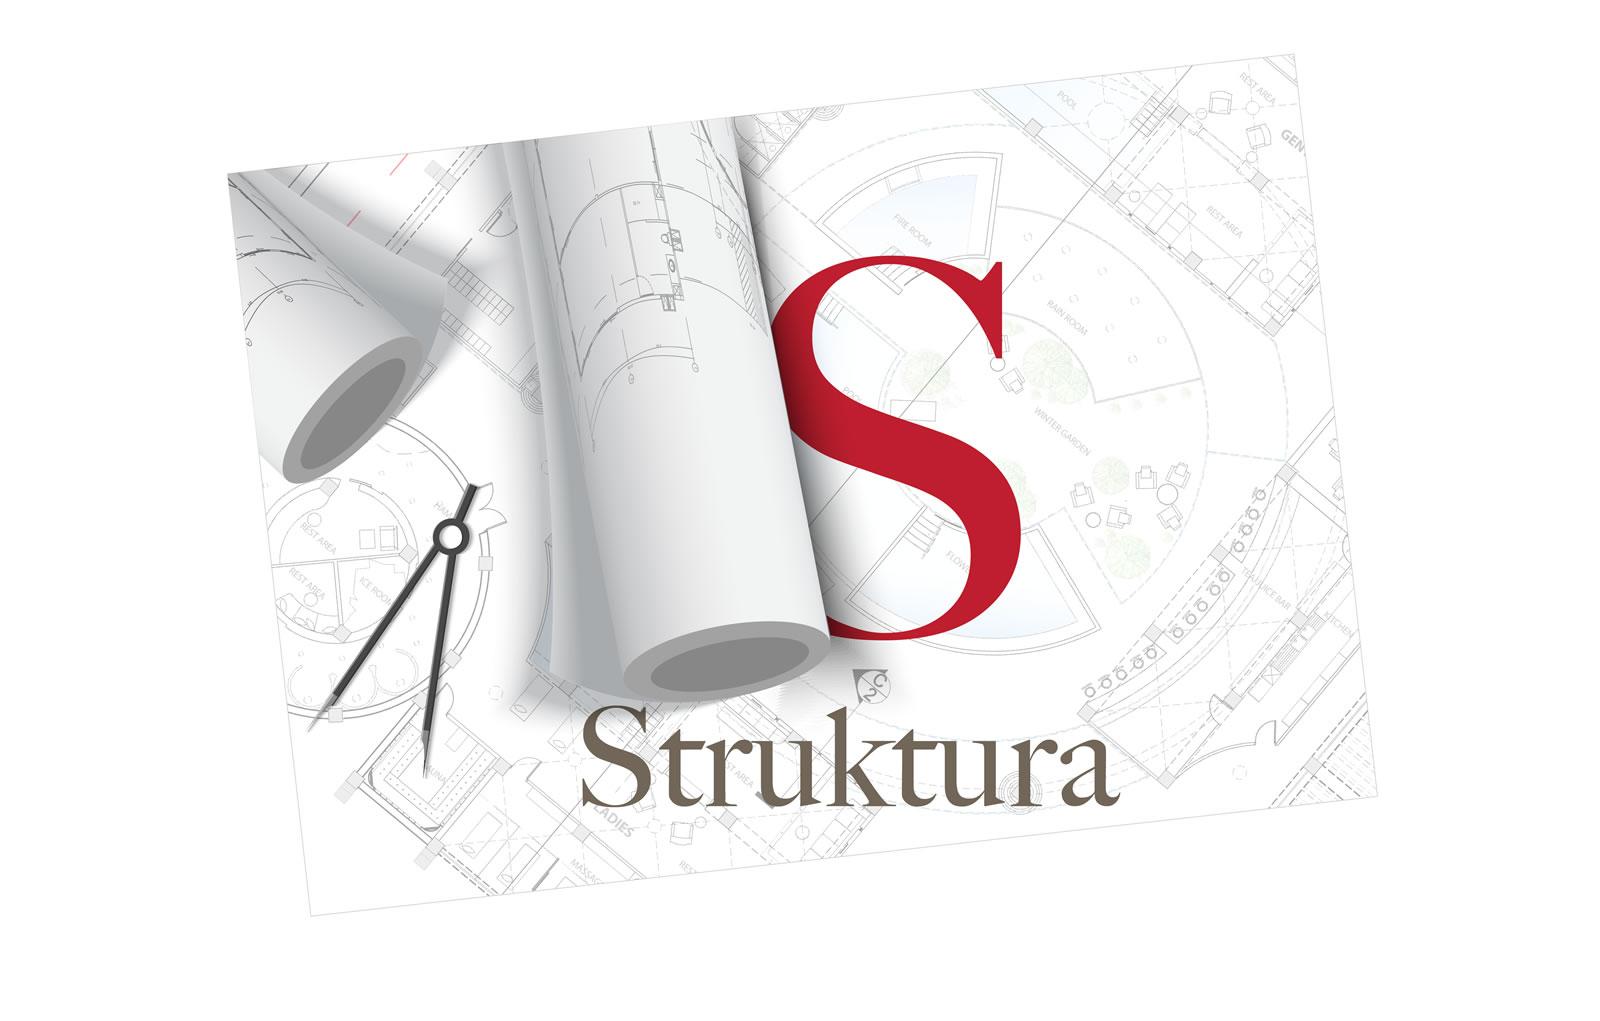 Struktura Interior Design Studio